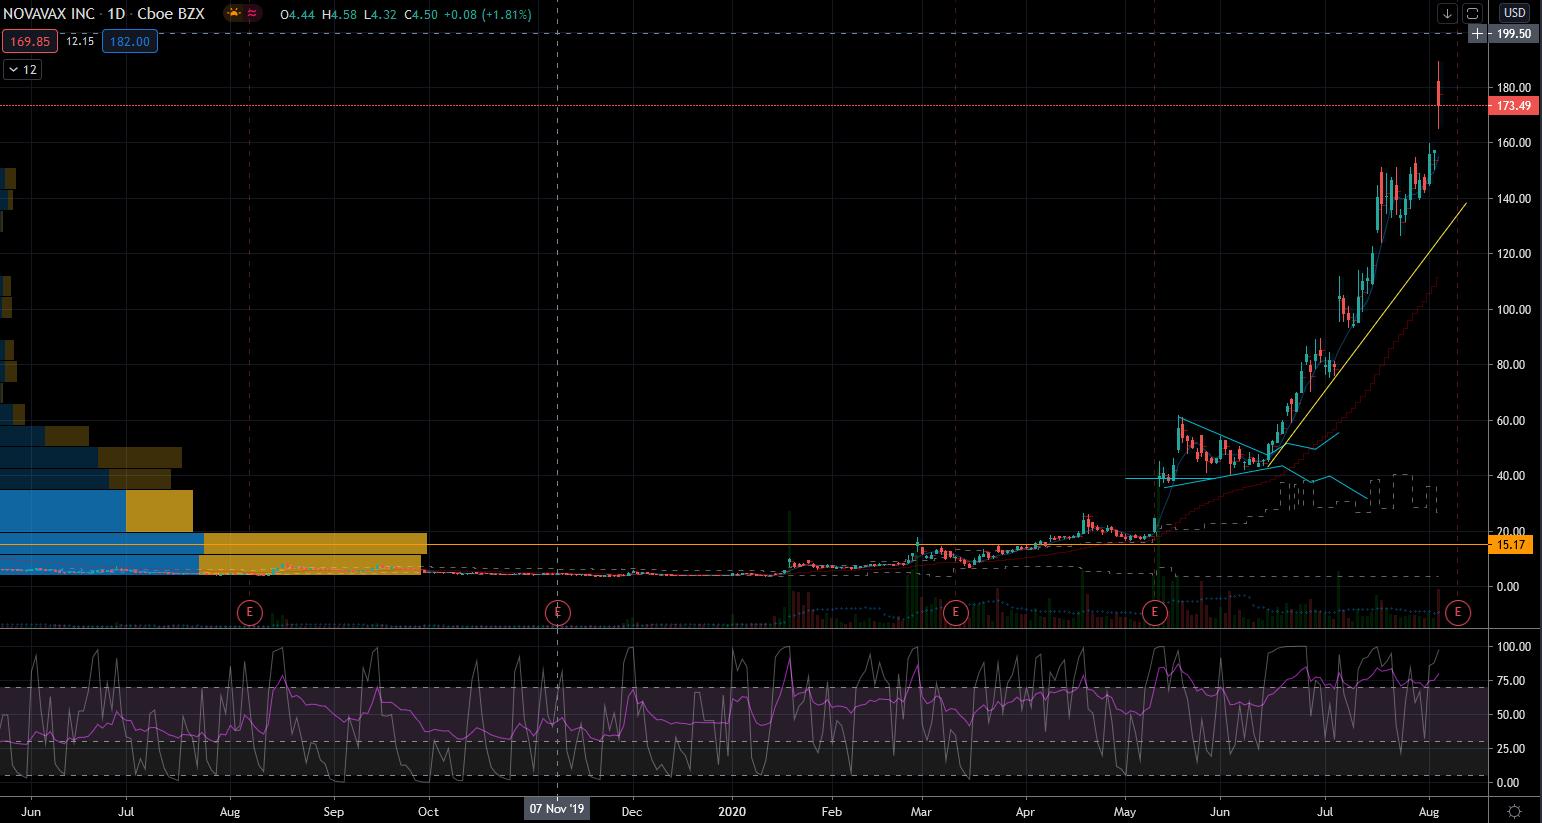 Hot Stocks: Novavax (NVAX) Stock Chart Showing Extended Exuberezce